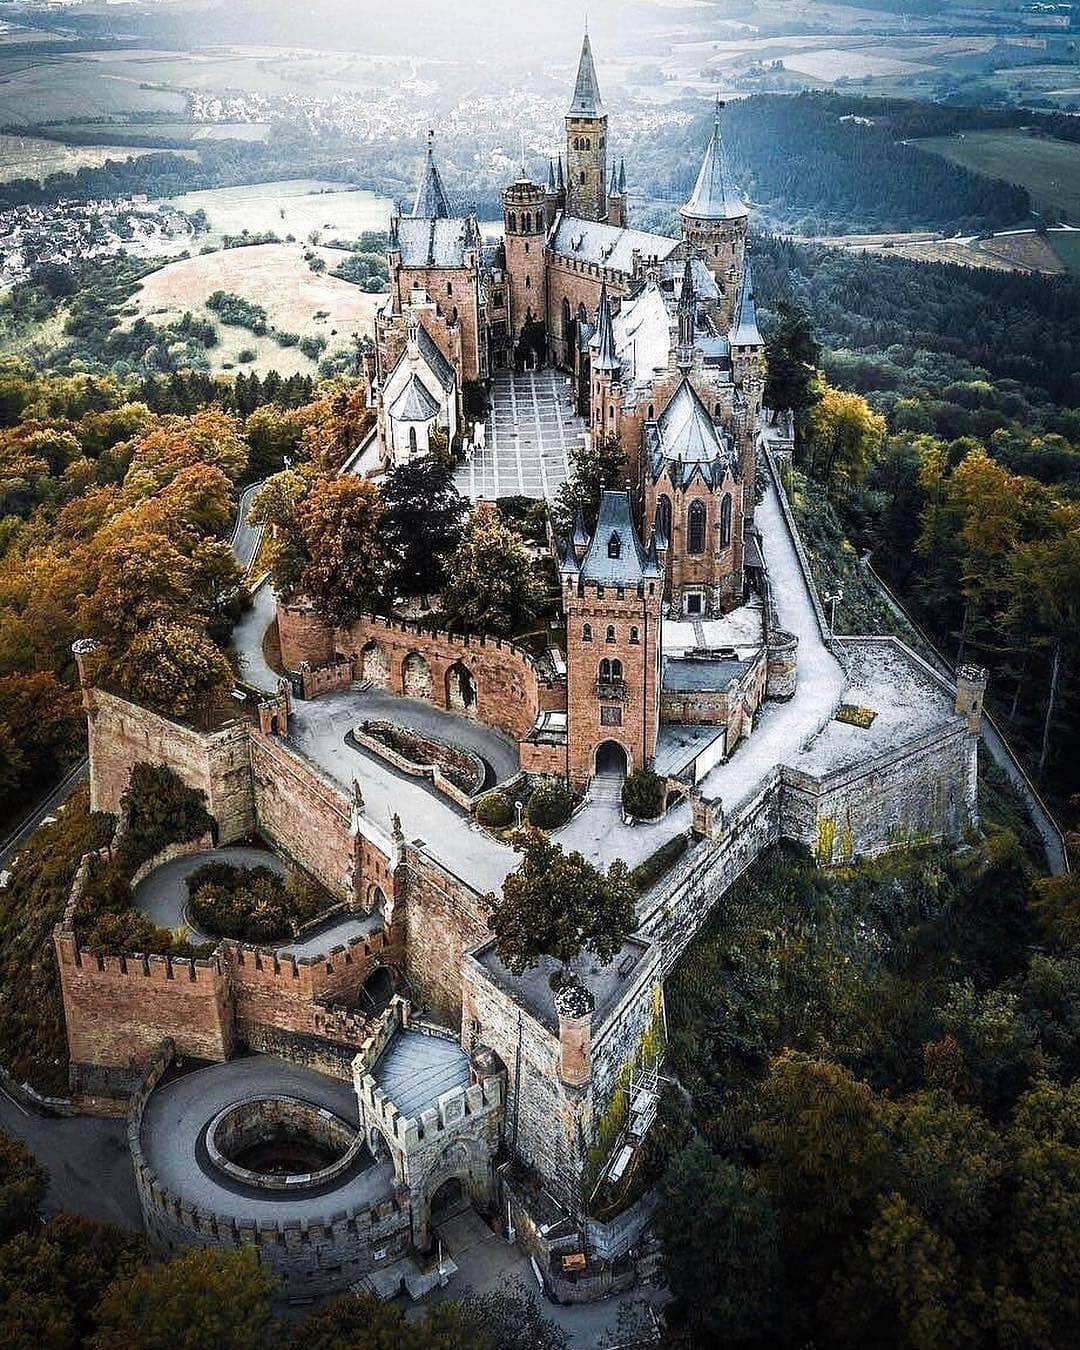 Castles In The World On Instagram Hohenzollern Castle Germany Repost Andre Diaz Schloss B Germany Castles Beautiful Castles Hohenzollern Castle